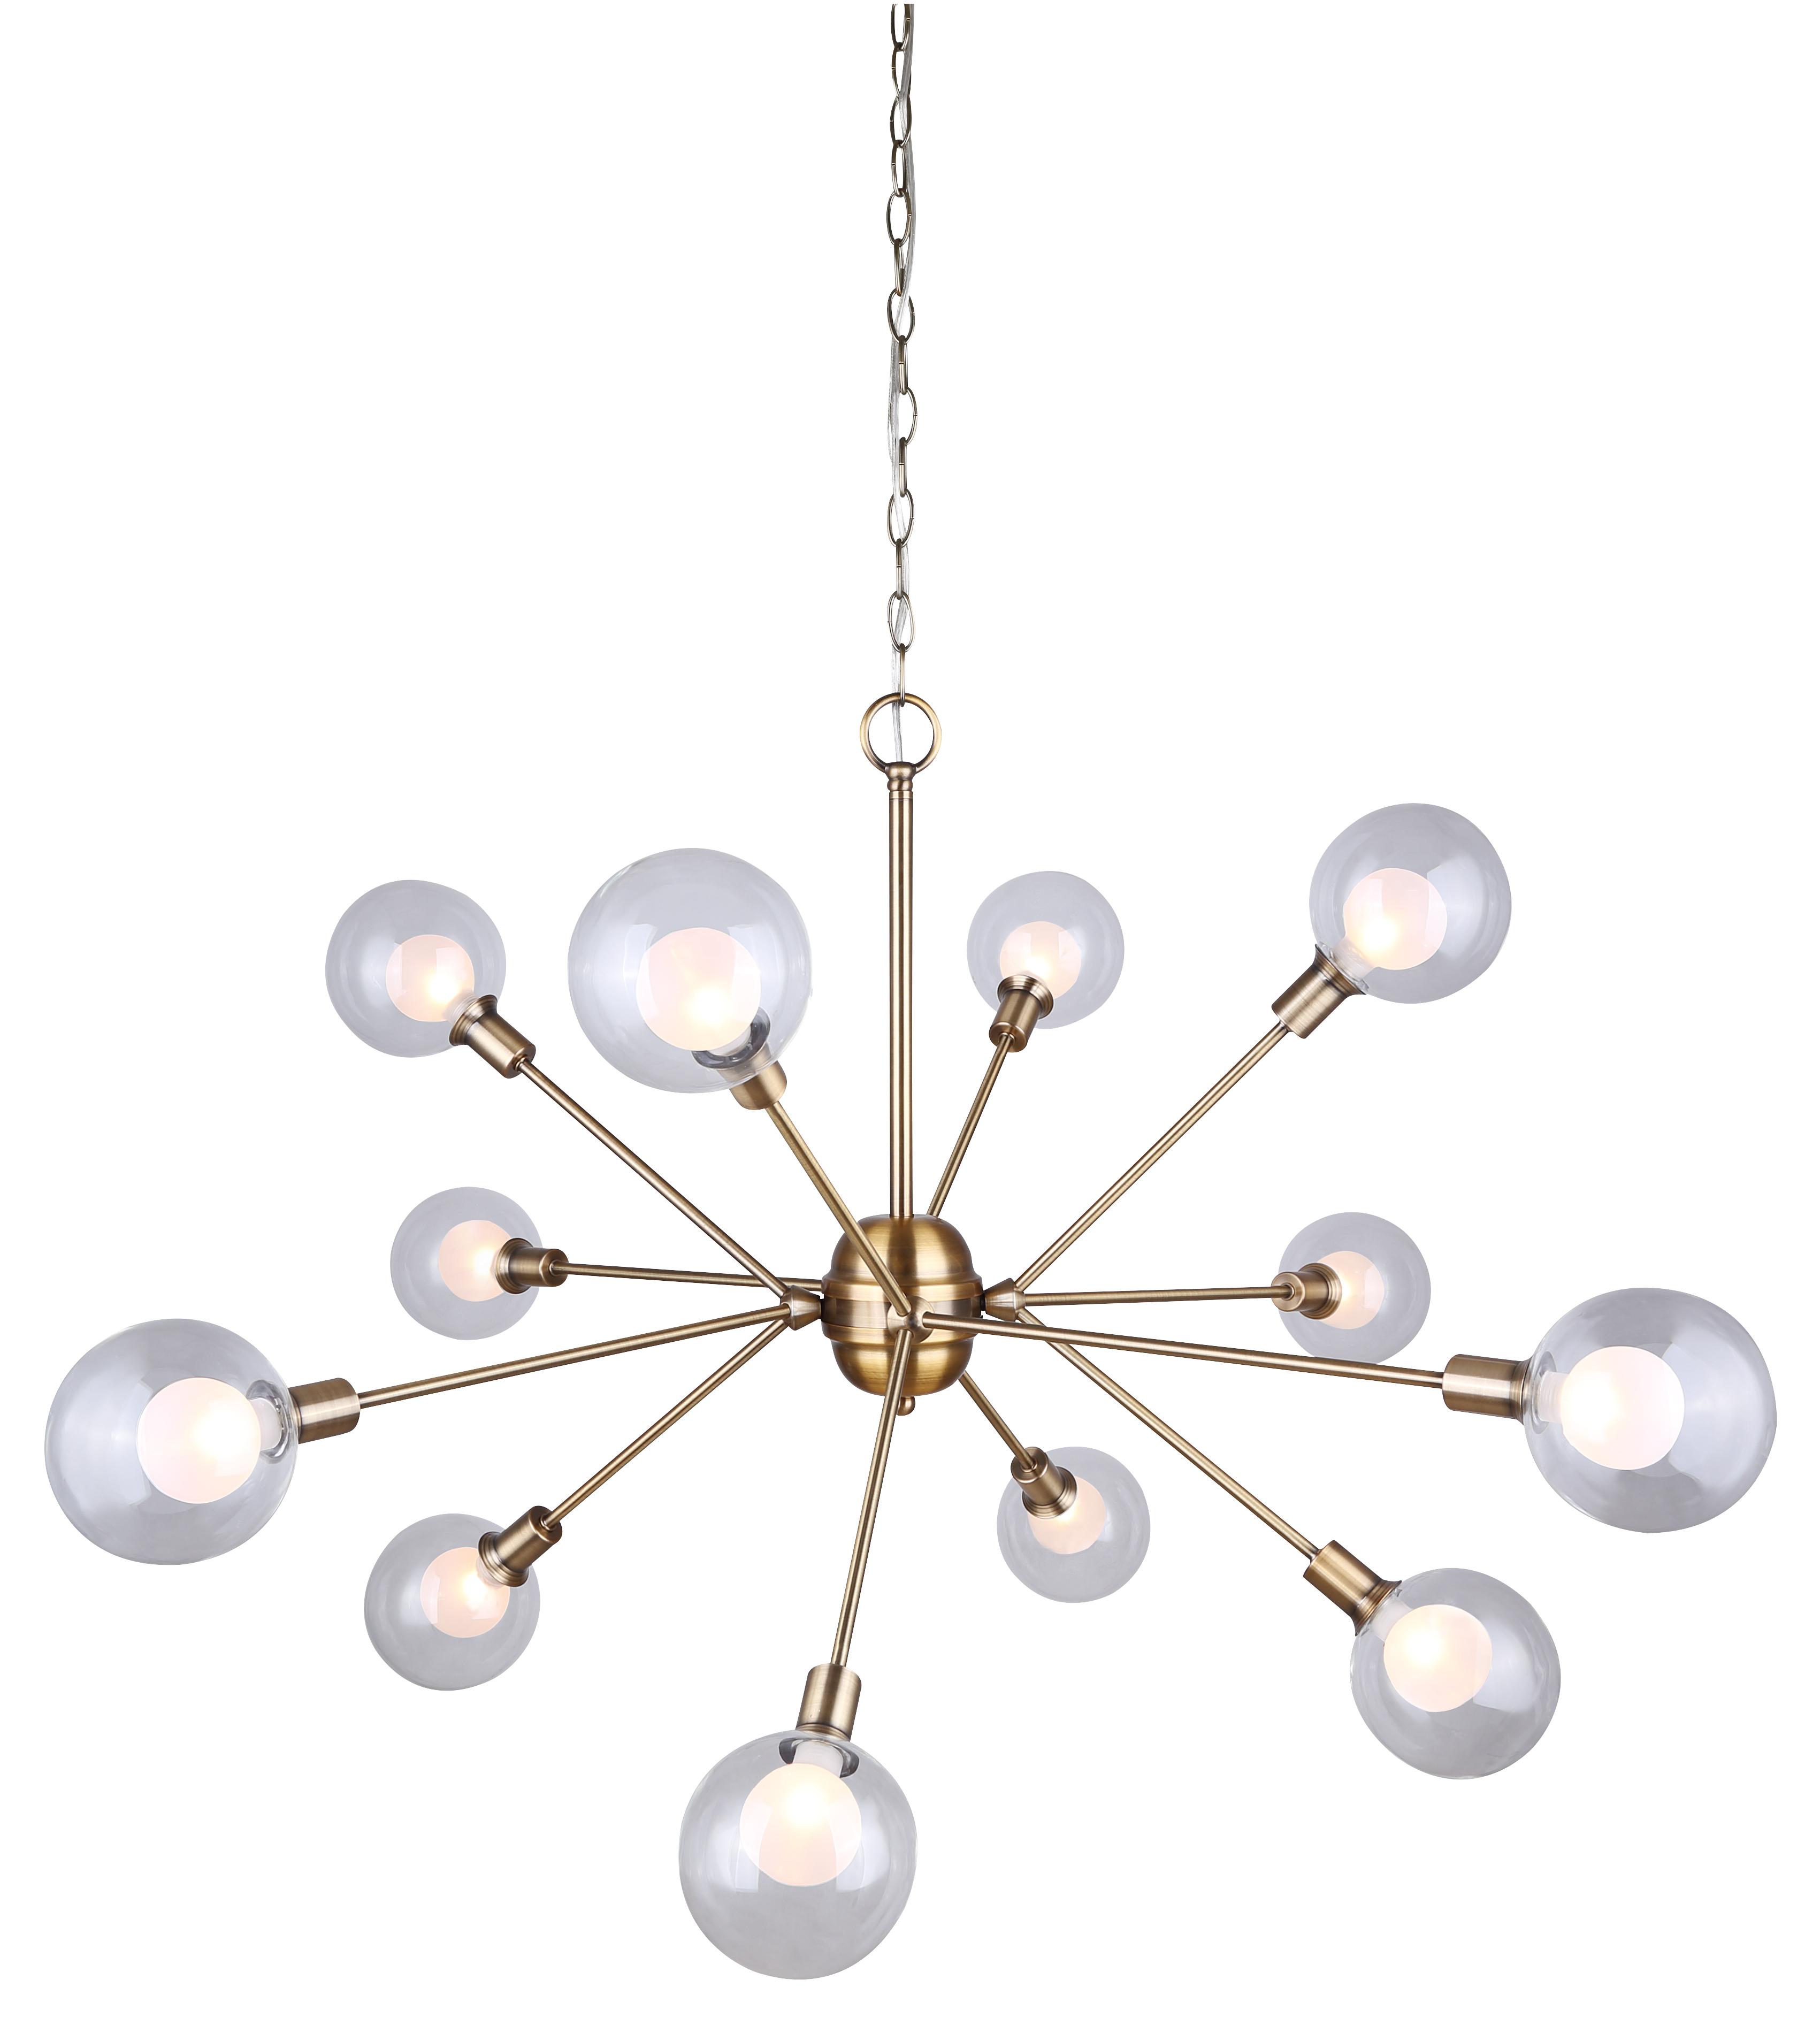 Estella Collection 12 Light Chandelier In Gold Ich683a12gd9